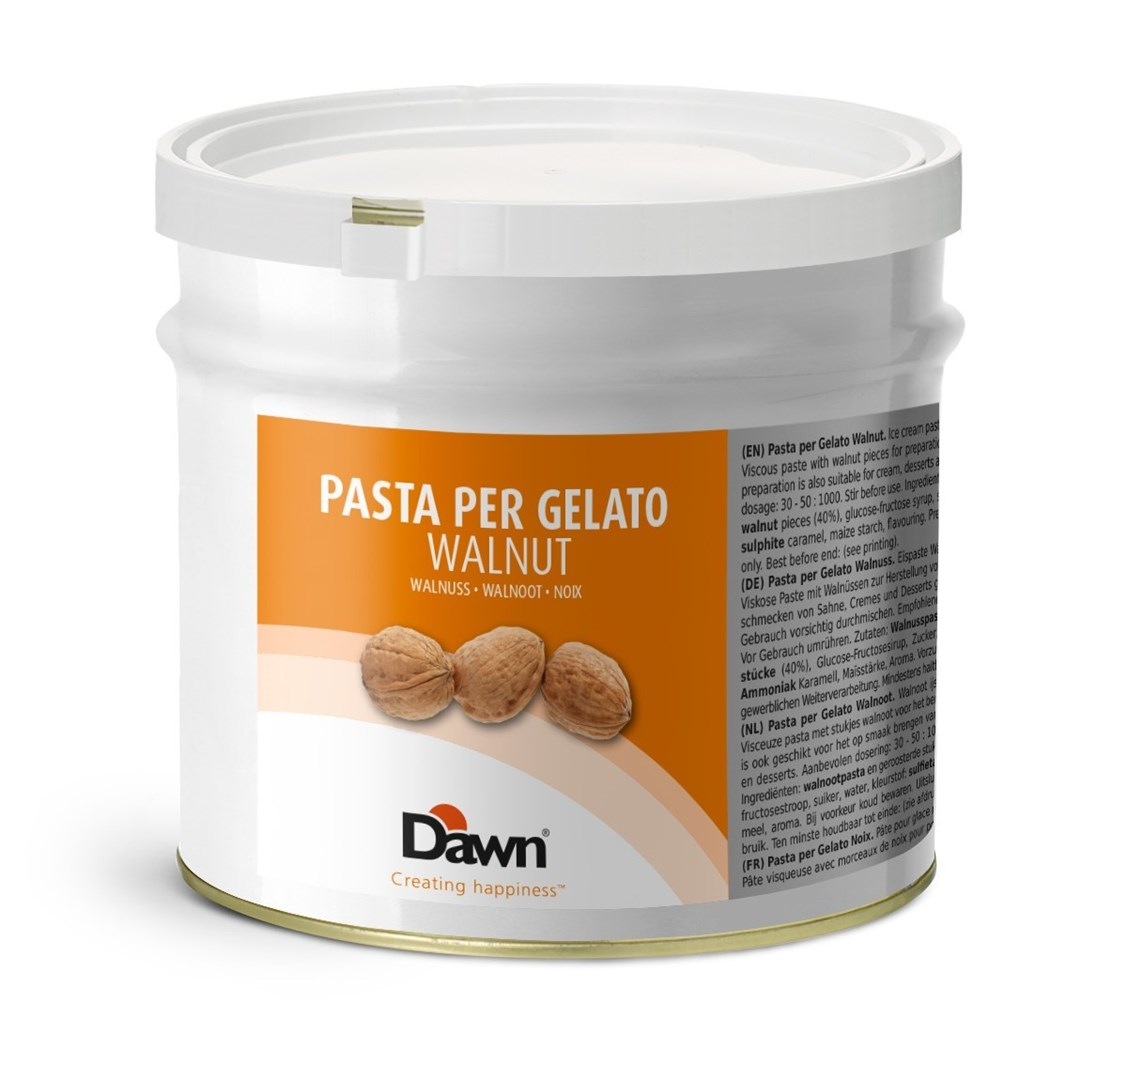 Productafbeelding Dawn Pasta Per Gelato Walnoot 3,5 kg blik